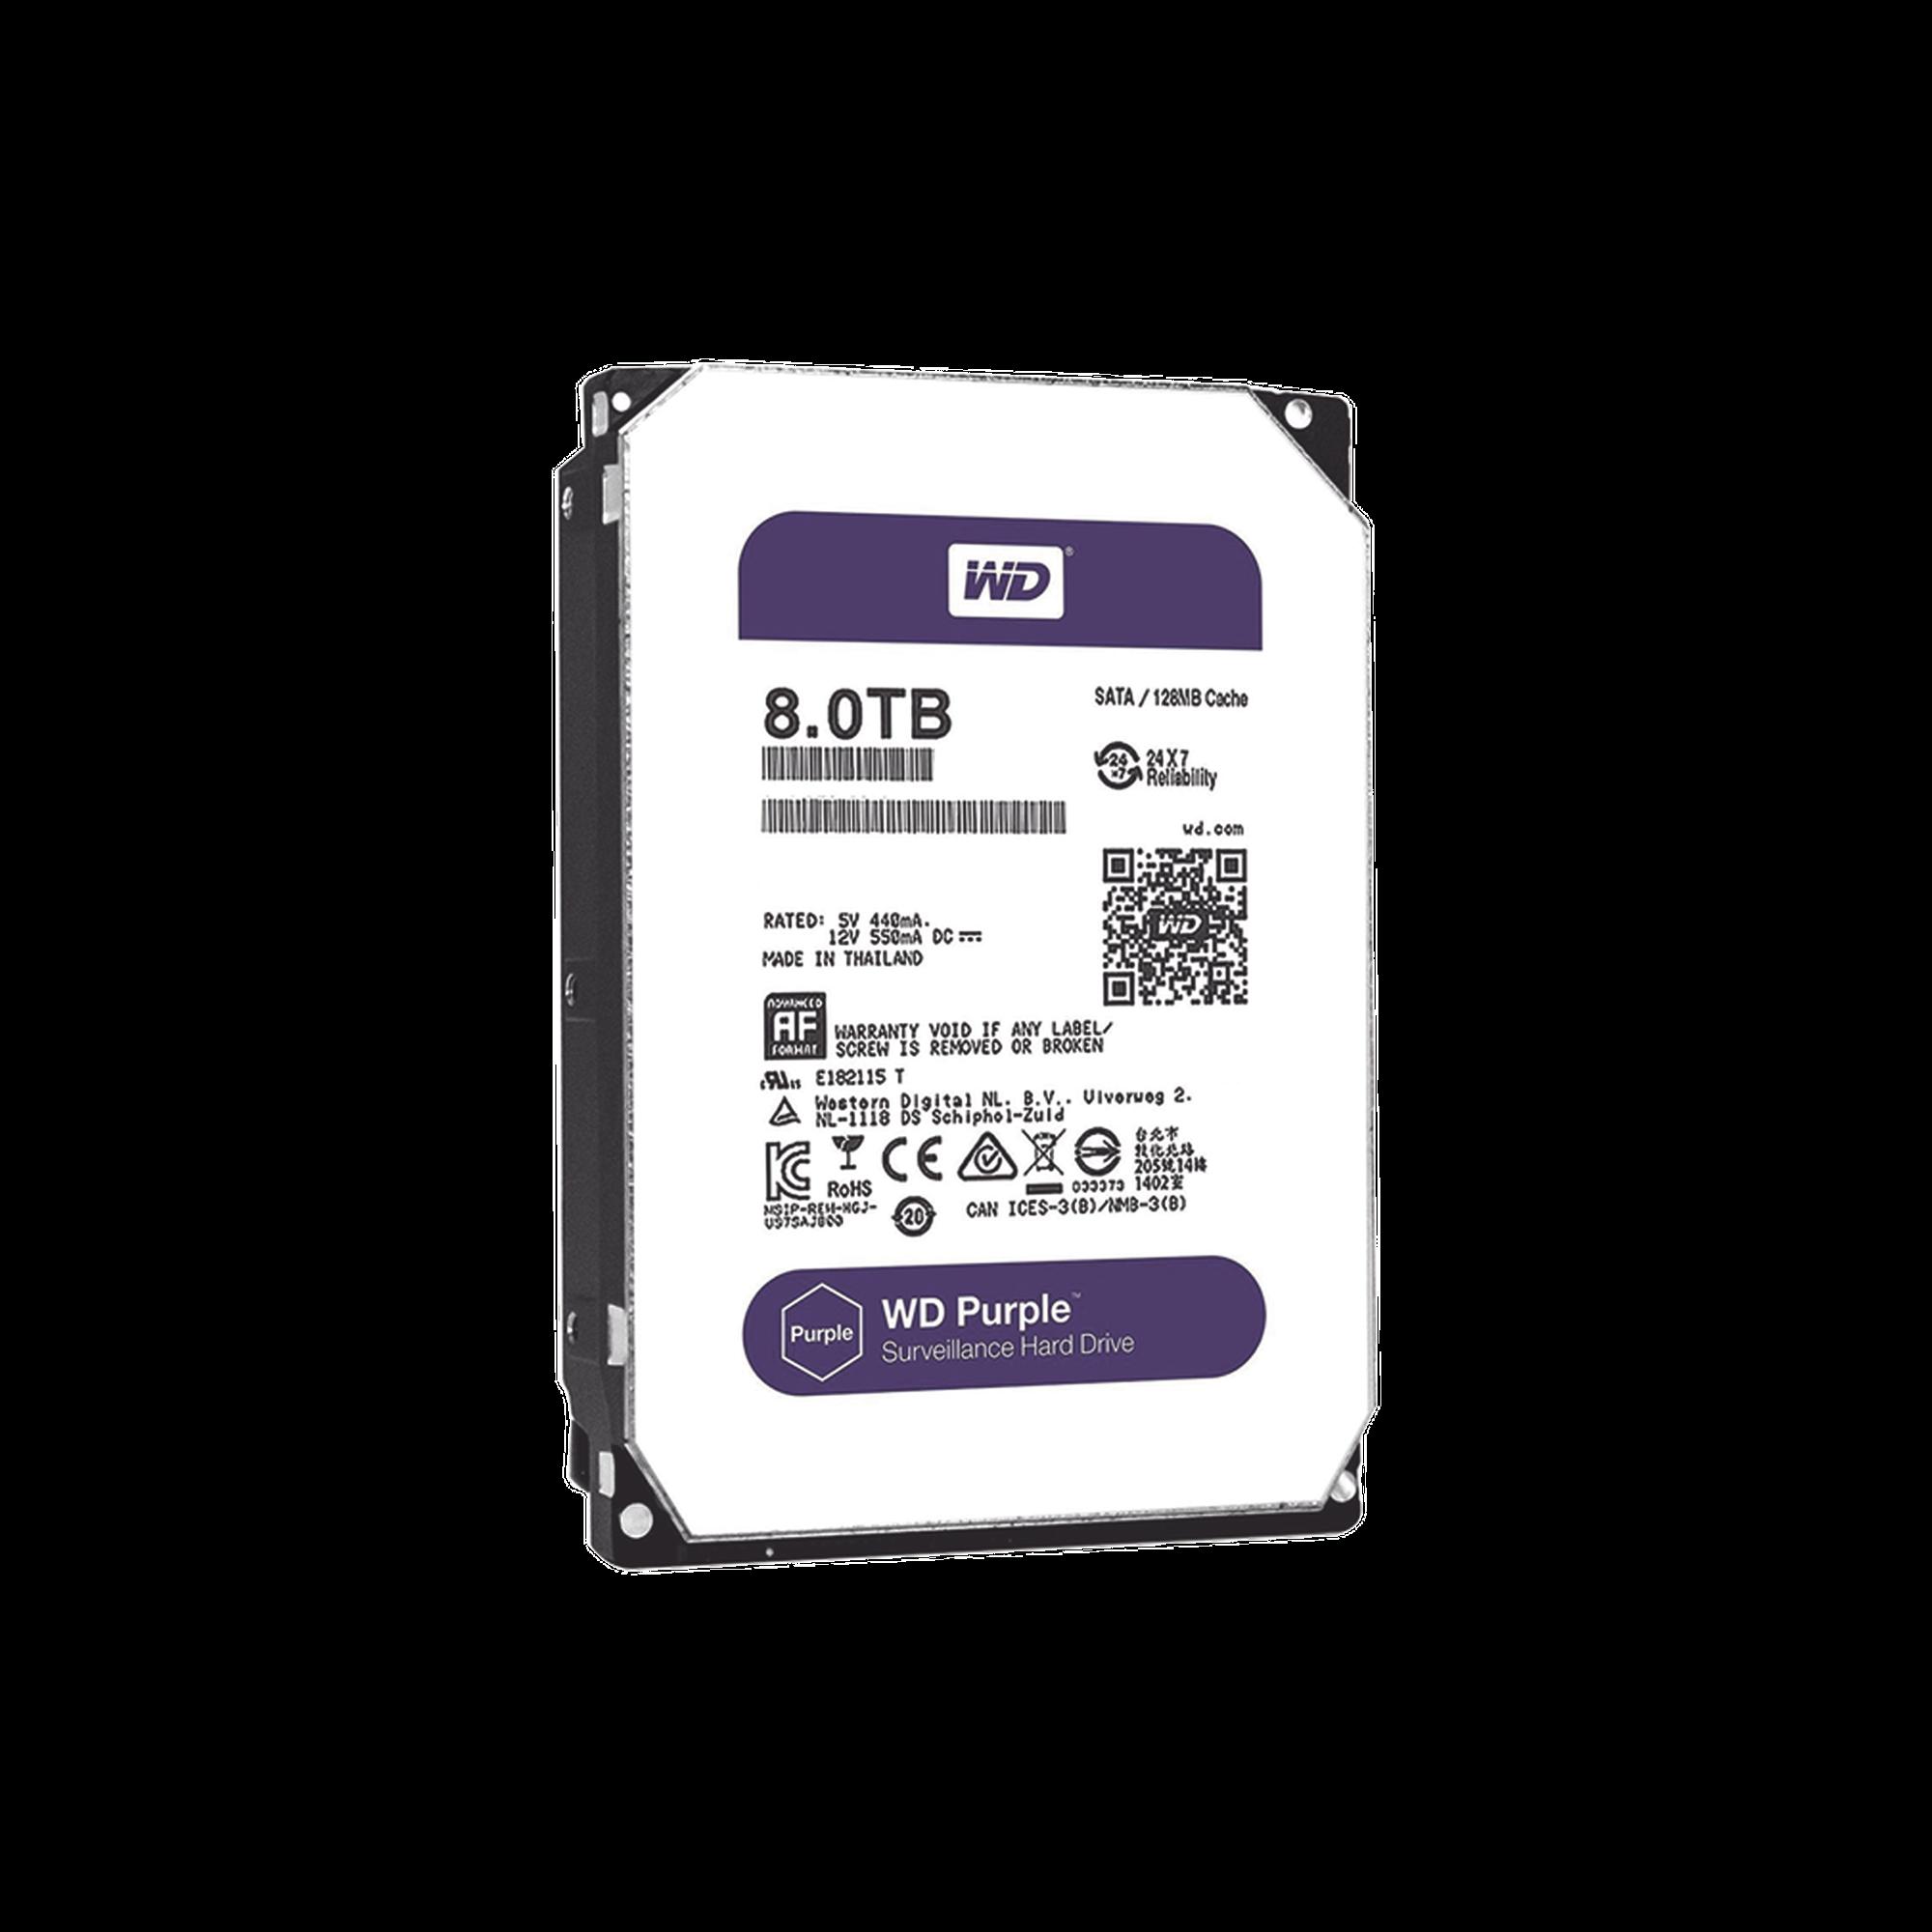 Disco duro WD de 8TB / 7200RPM / Optimizado para Videovigilancia